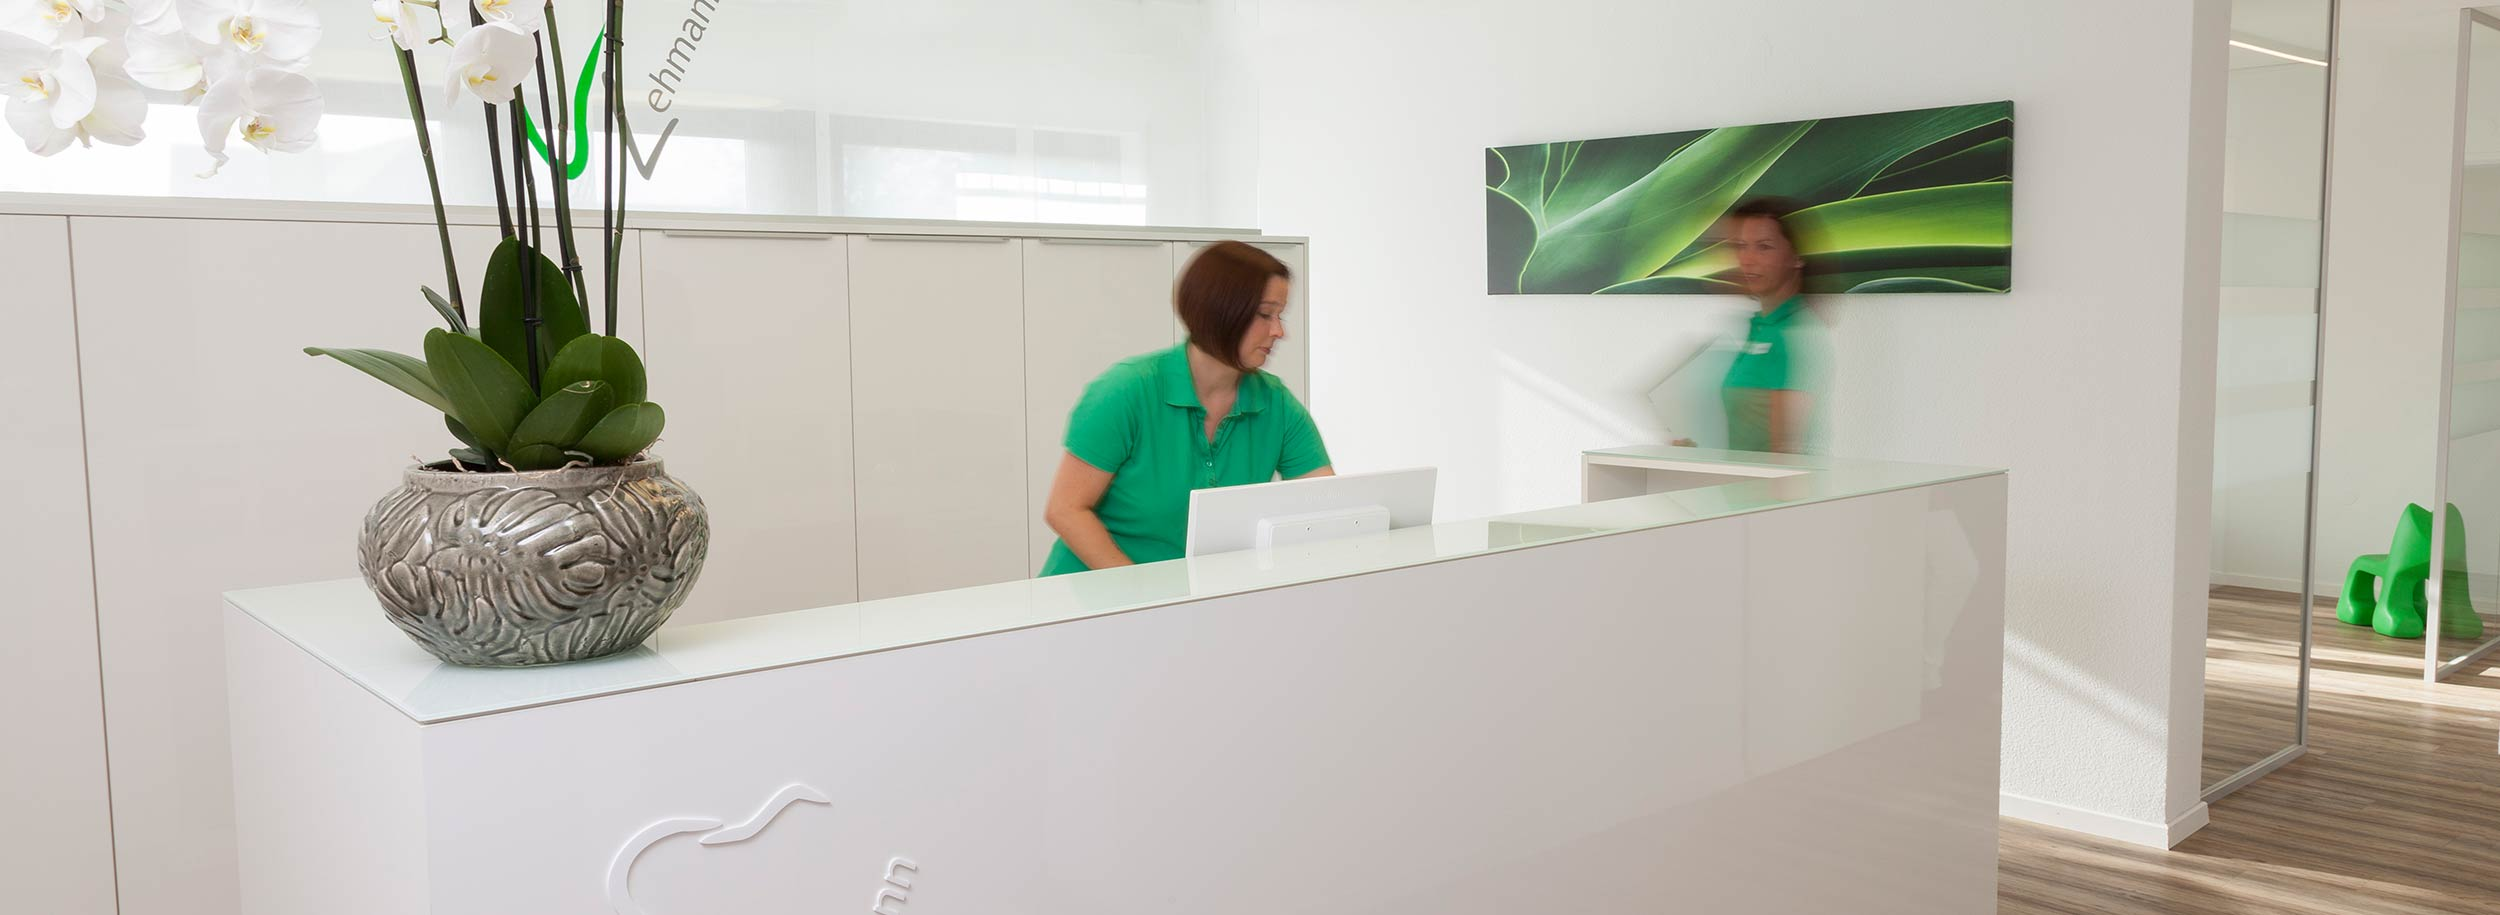 Zahnarzt Rüppurr Dr. Verena Lehmann